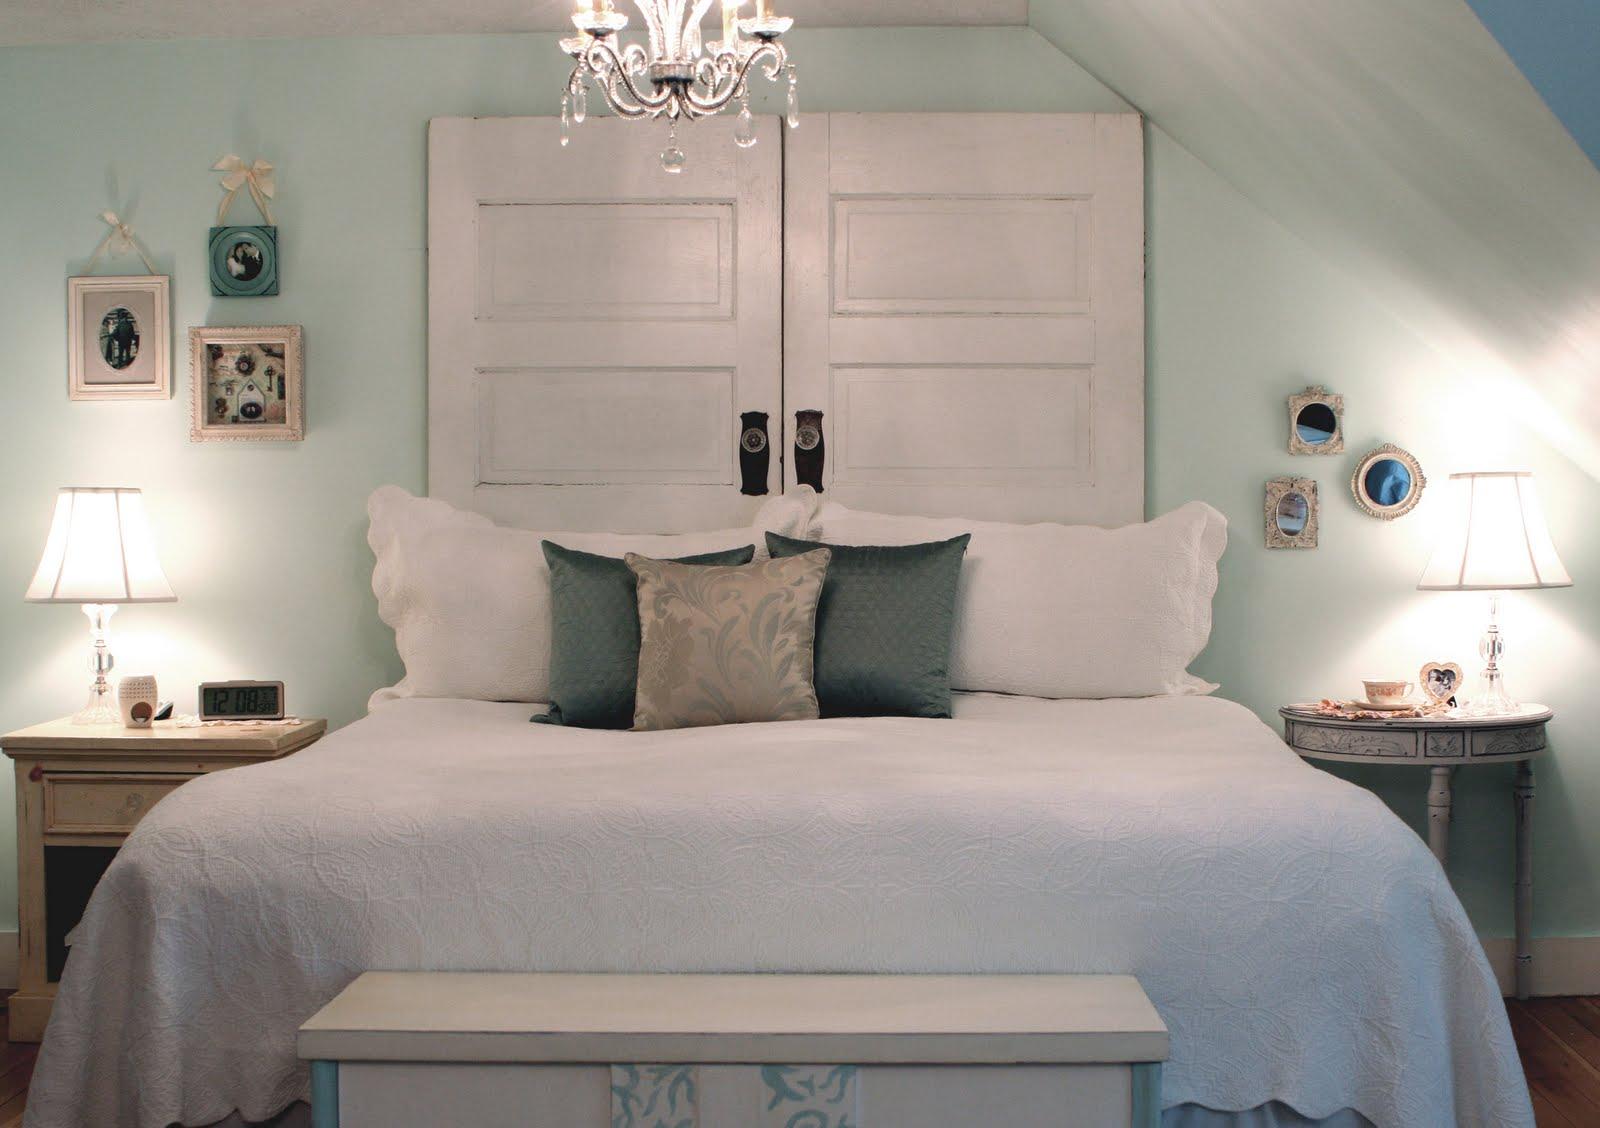 Blog de decorar ideias criativas para cabeceiras de cama box for Fun headboard ideas